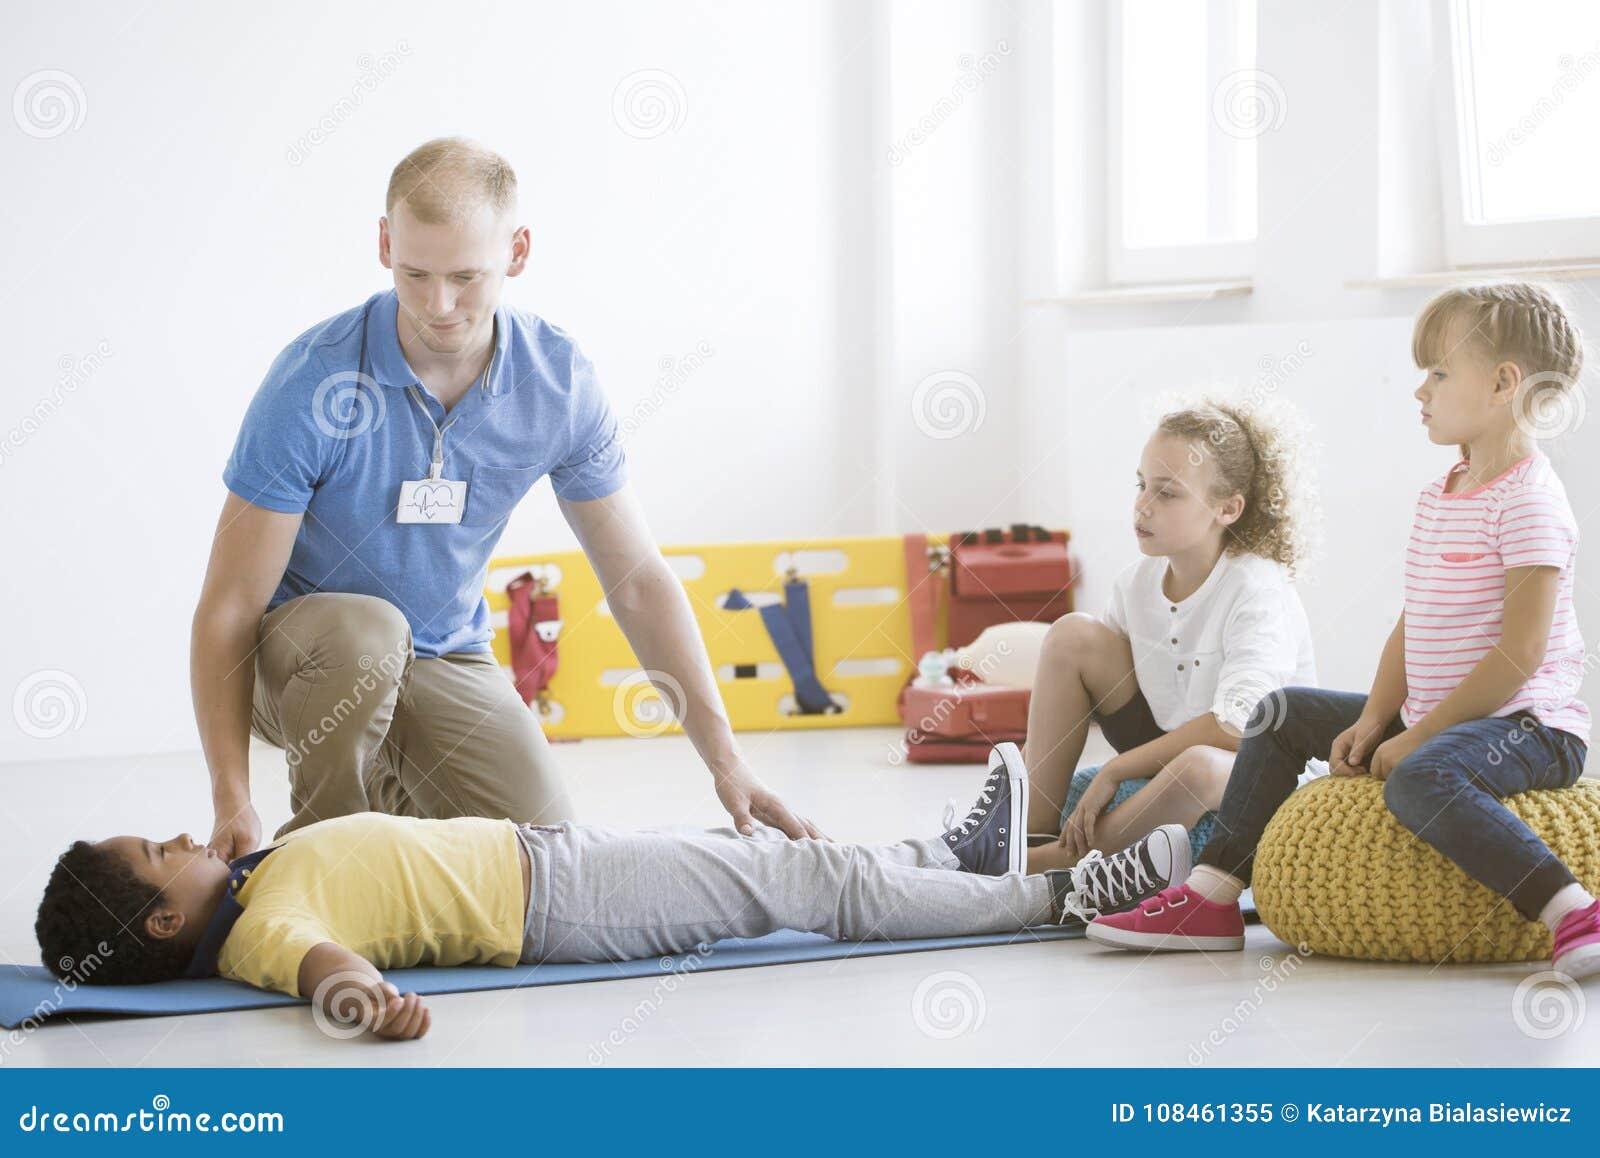 Boy during first aid training